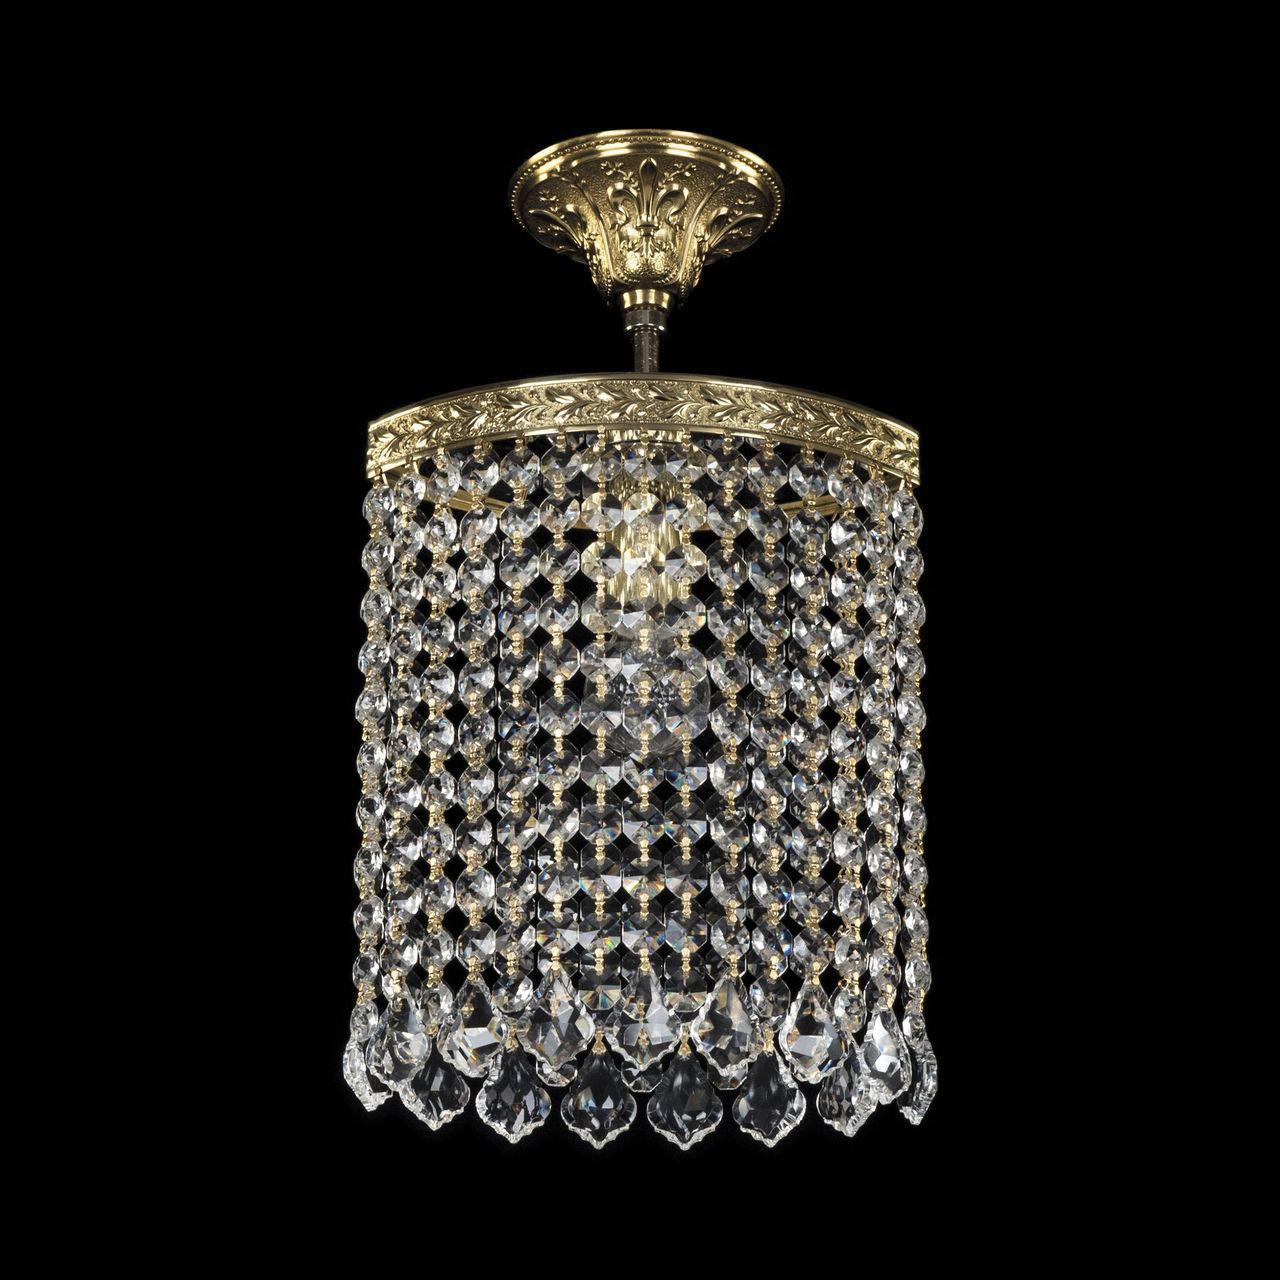 Подвесной светильник Bohemia Ivele 19203/20IV G Leafs